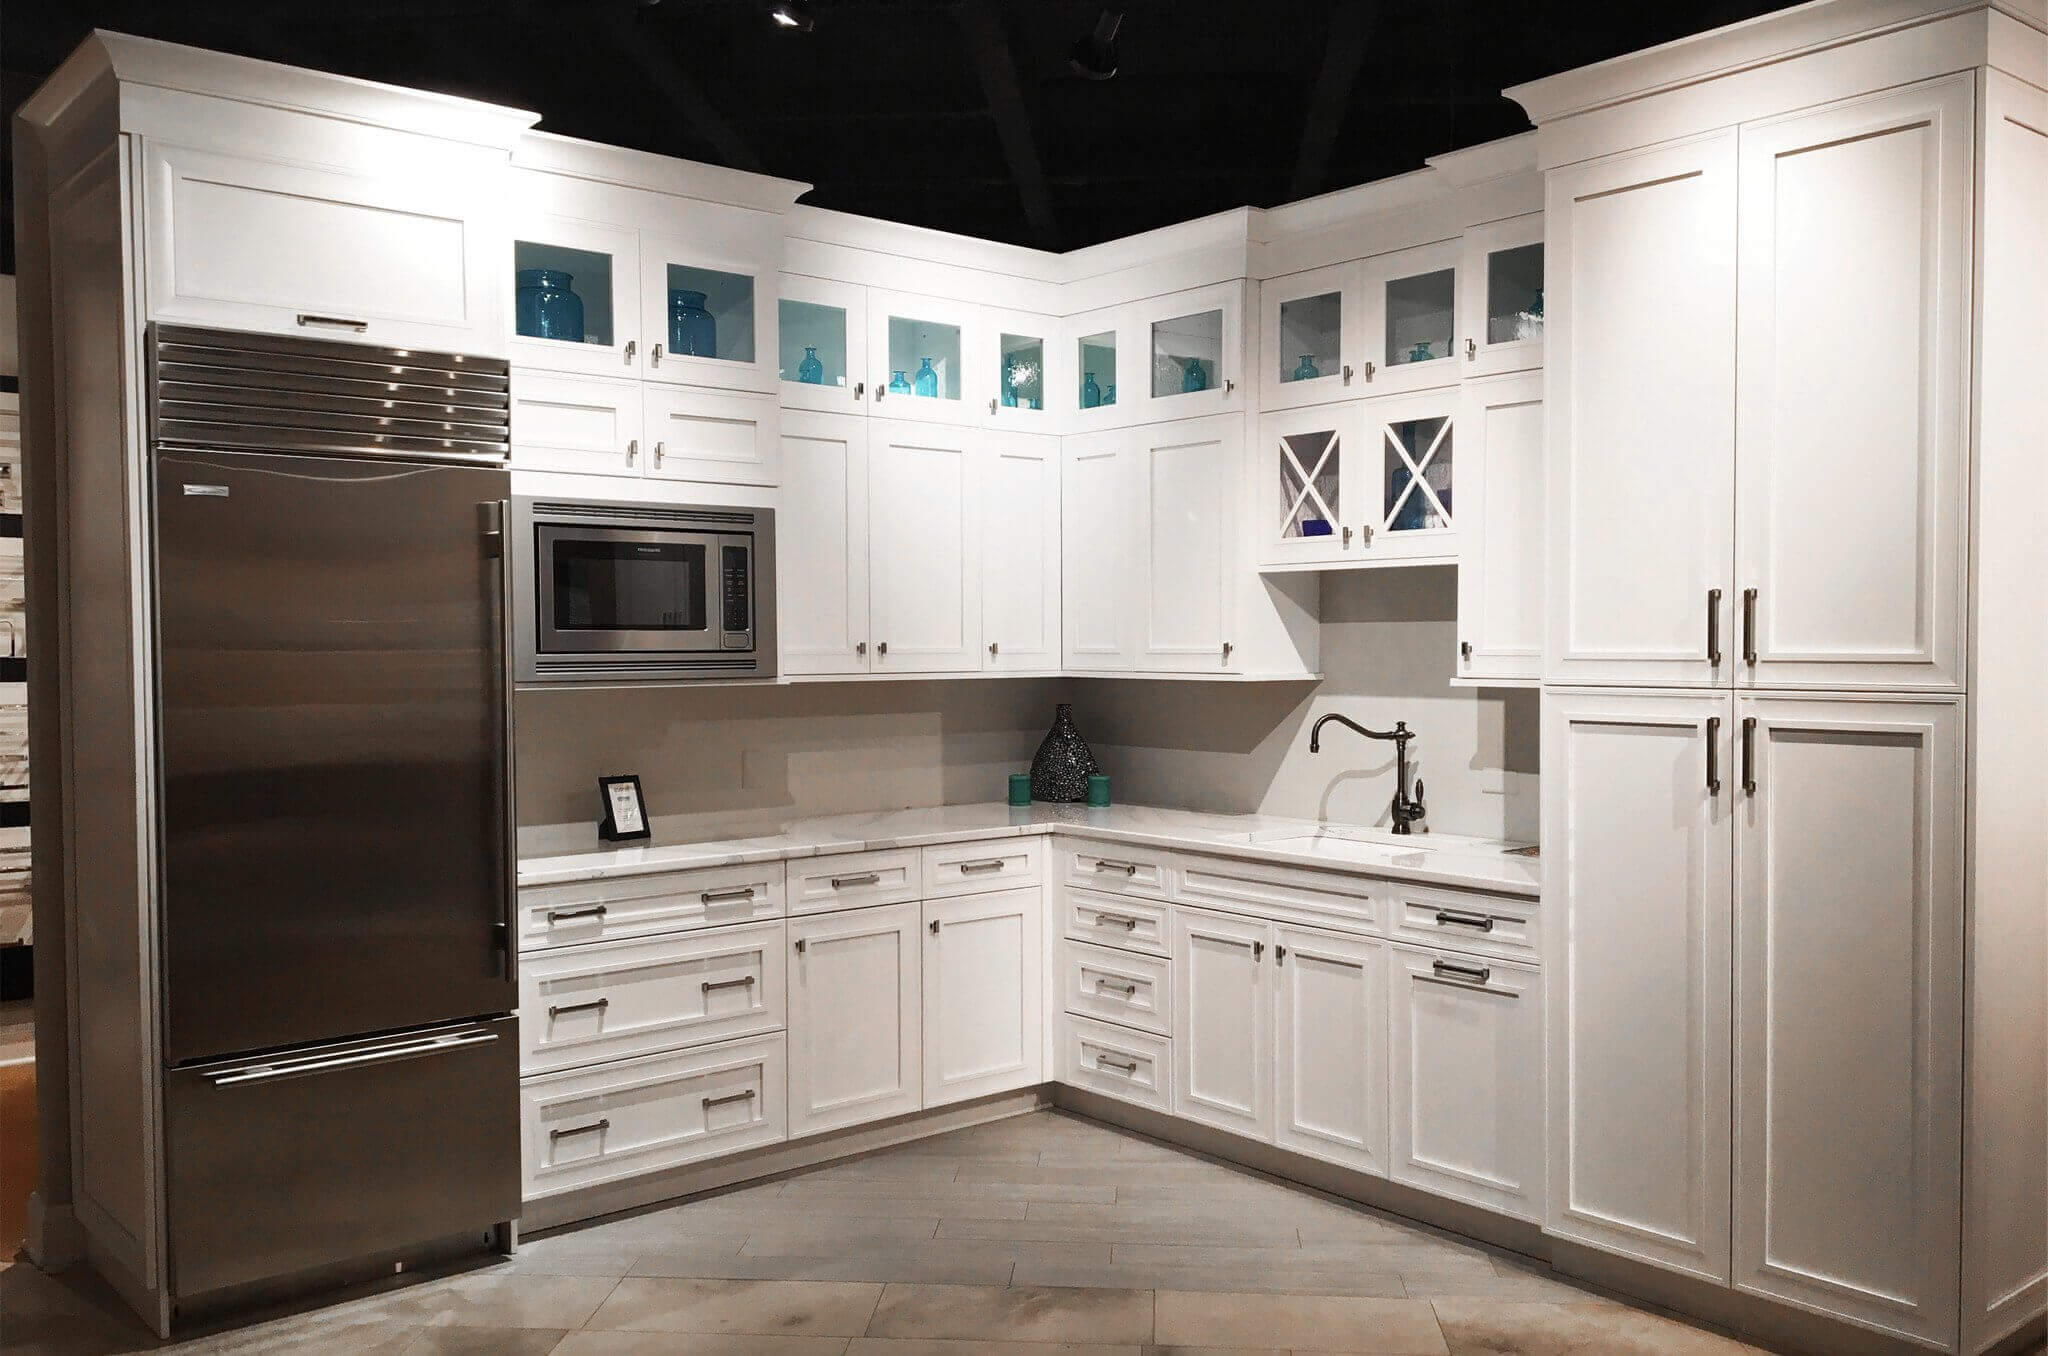 studio41 home design showroom locations highland park north shore virtual showroom tour